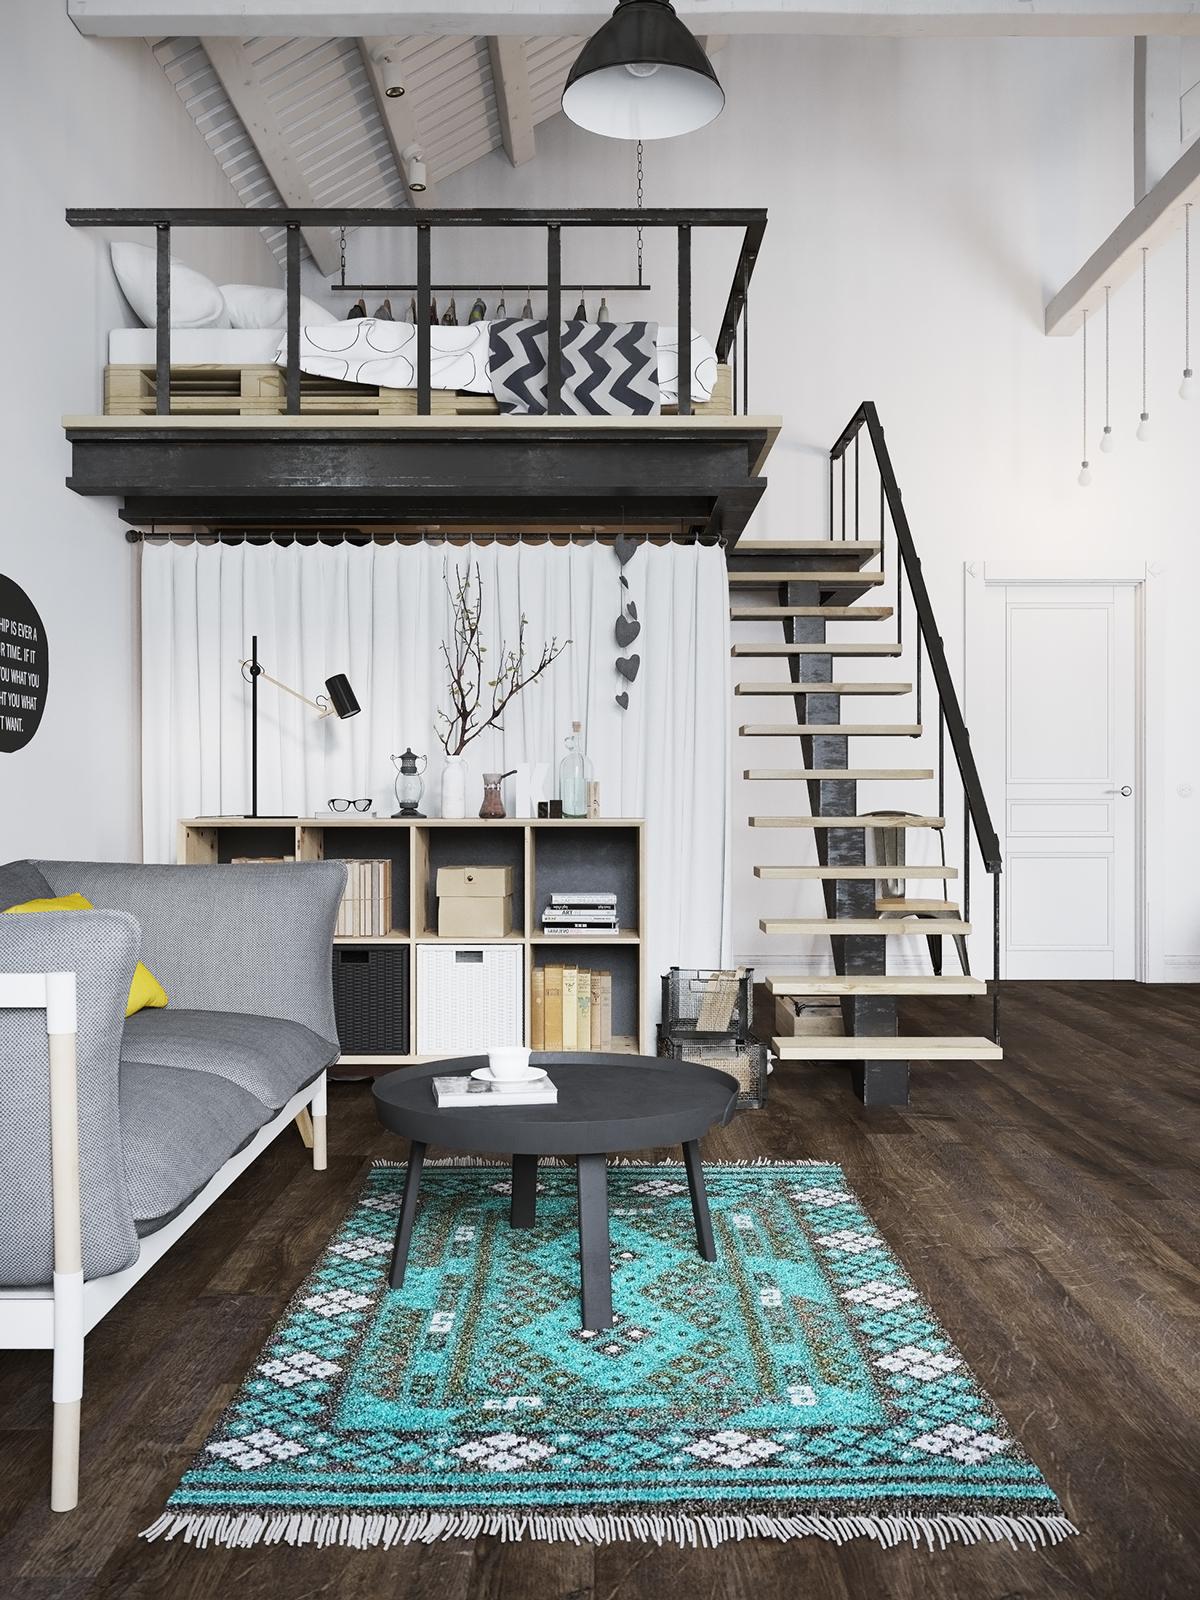 lofted-bedroom-design